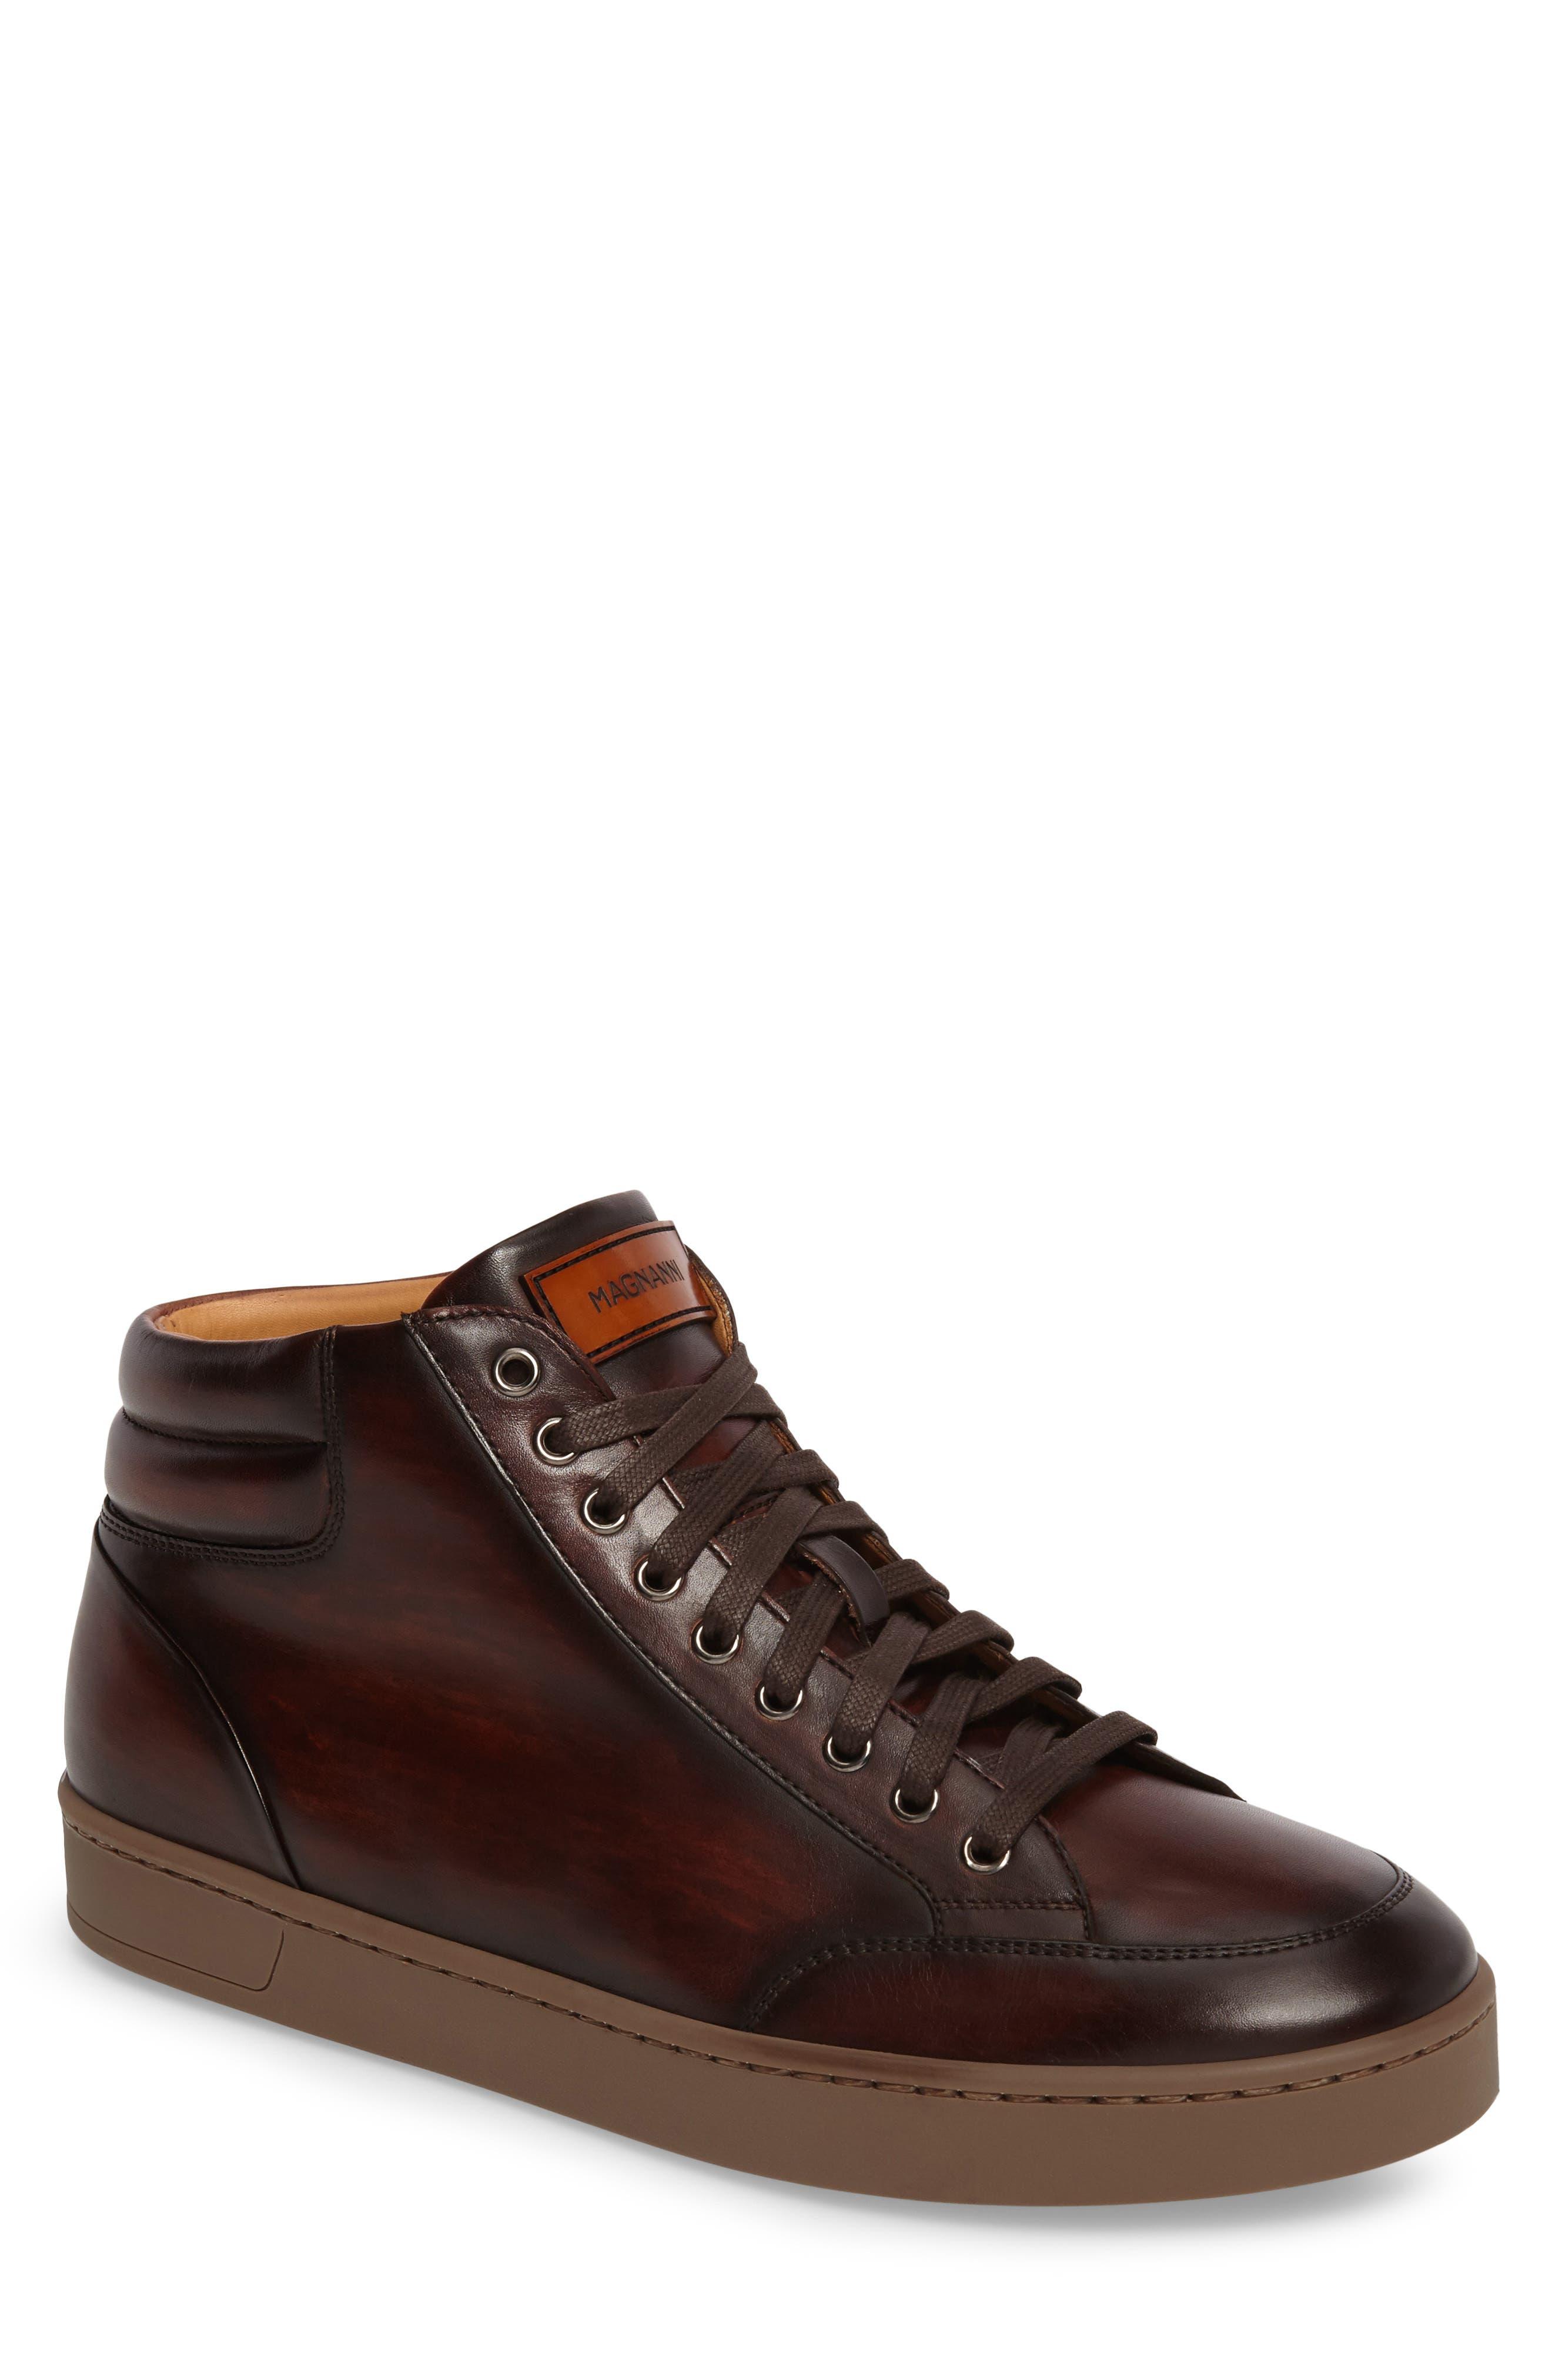 Carmel Sneaker,                             Main thumbnail 1, color,                             210